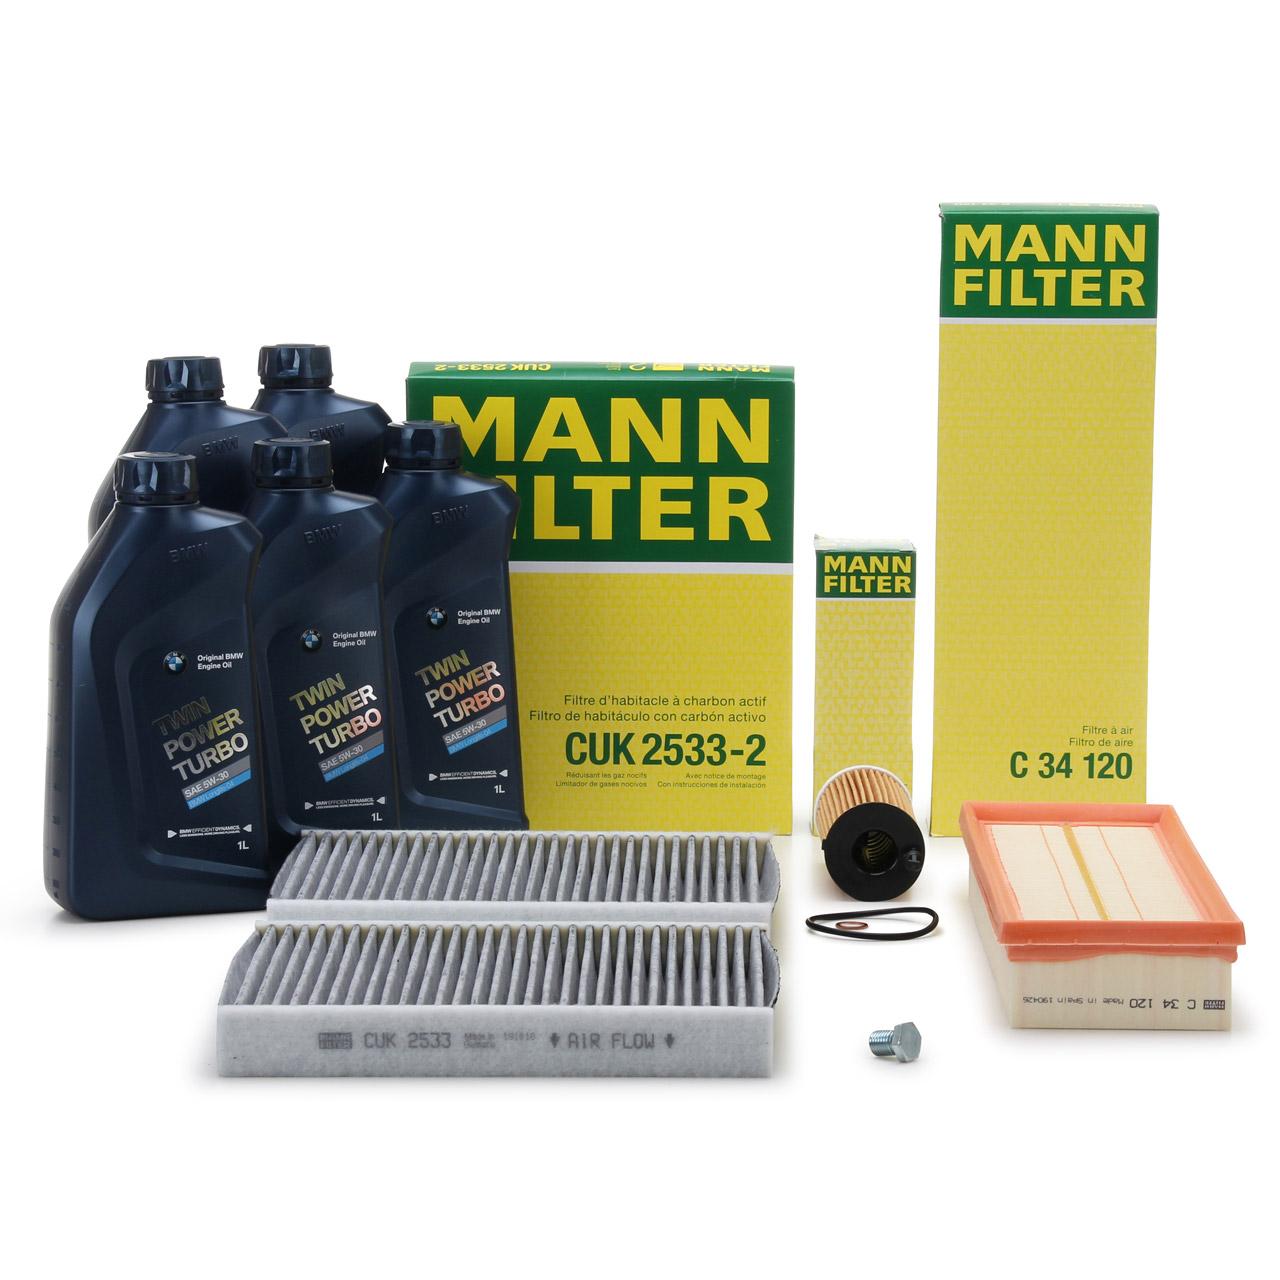 MANN Inspektionskit + 5 L ORIGINAL BMW 5W30 Motoröl für 5er F10 F11 518d 520d